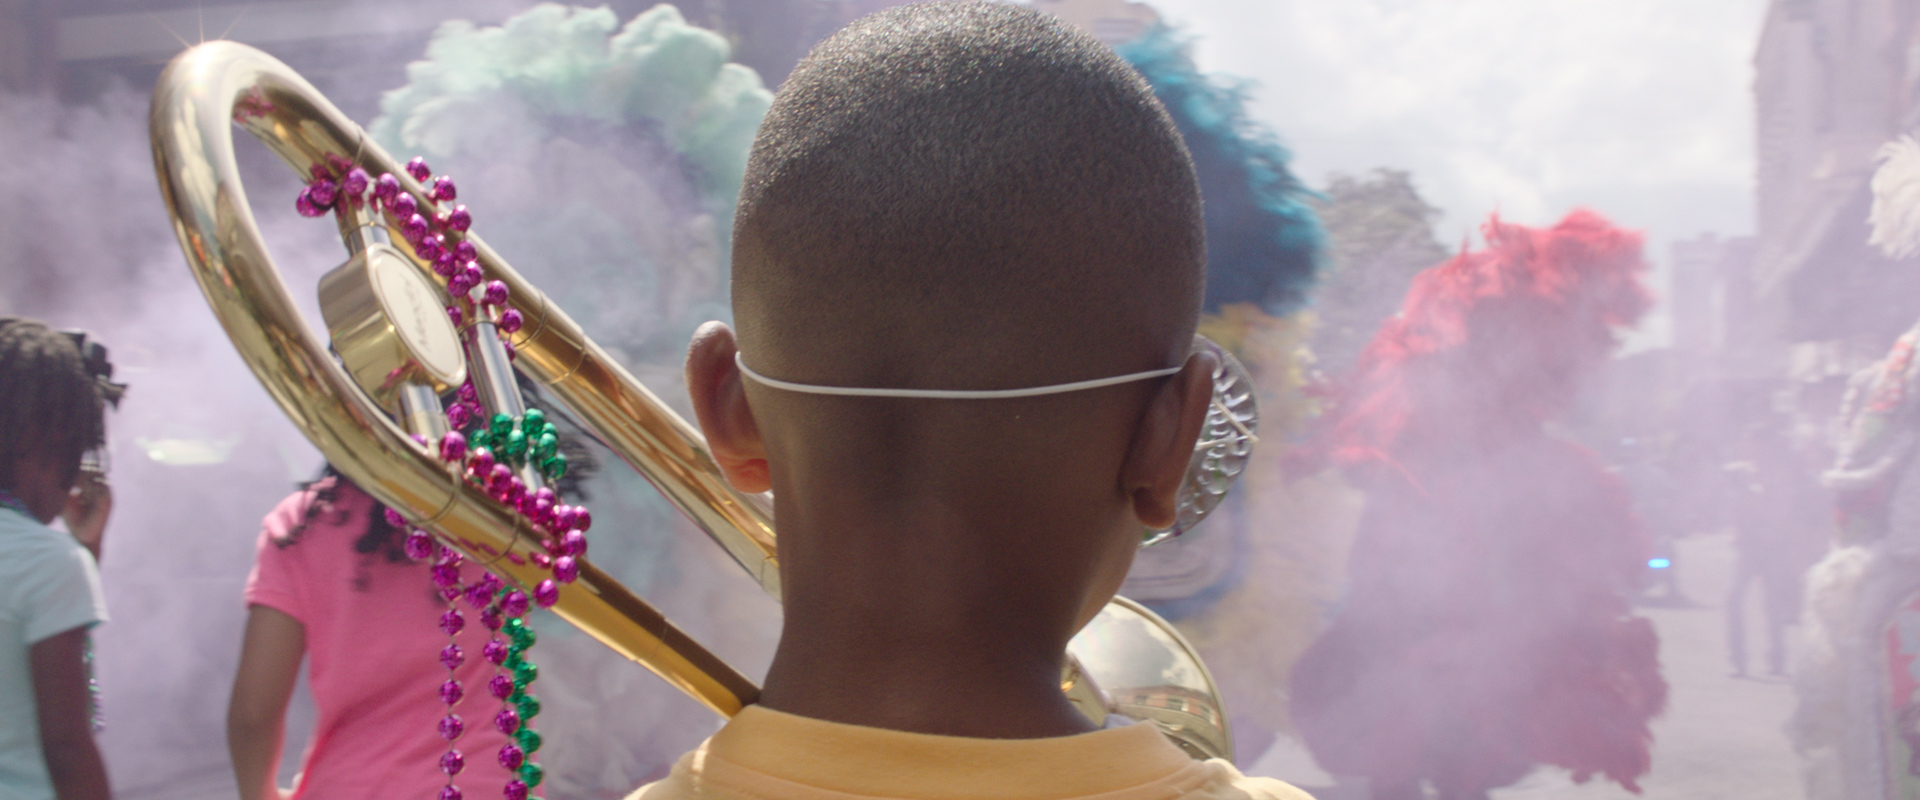 kid w trimbone from behind 2.jpg